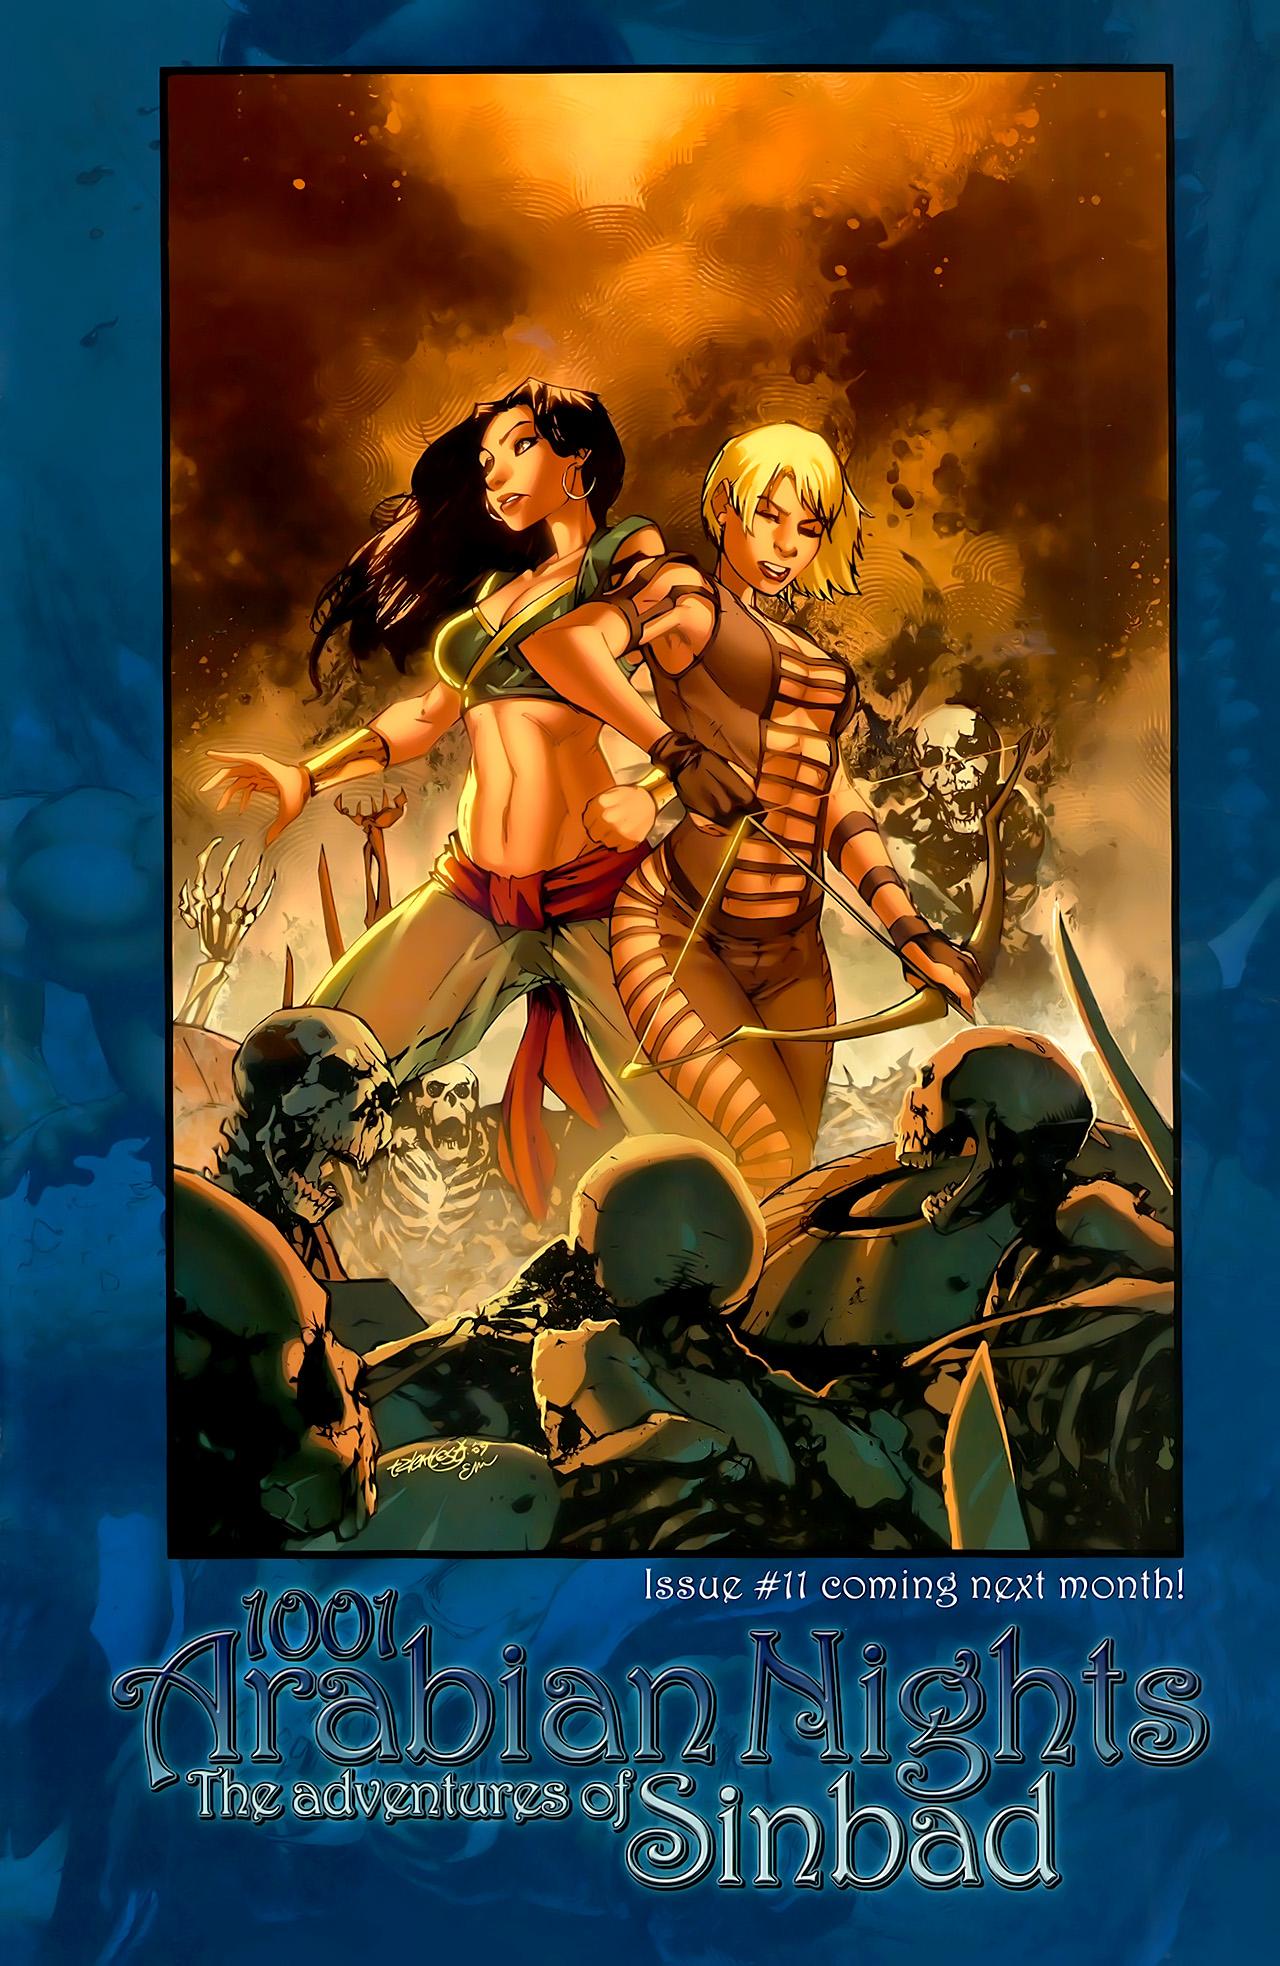 Read online 1001 Arabian Nights: The Adventures of Sinbad comic -  Issue #10 - 25